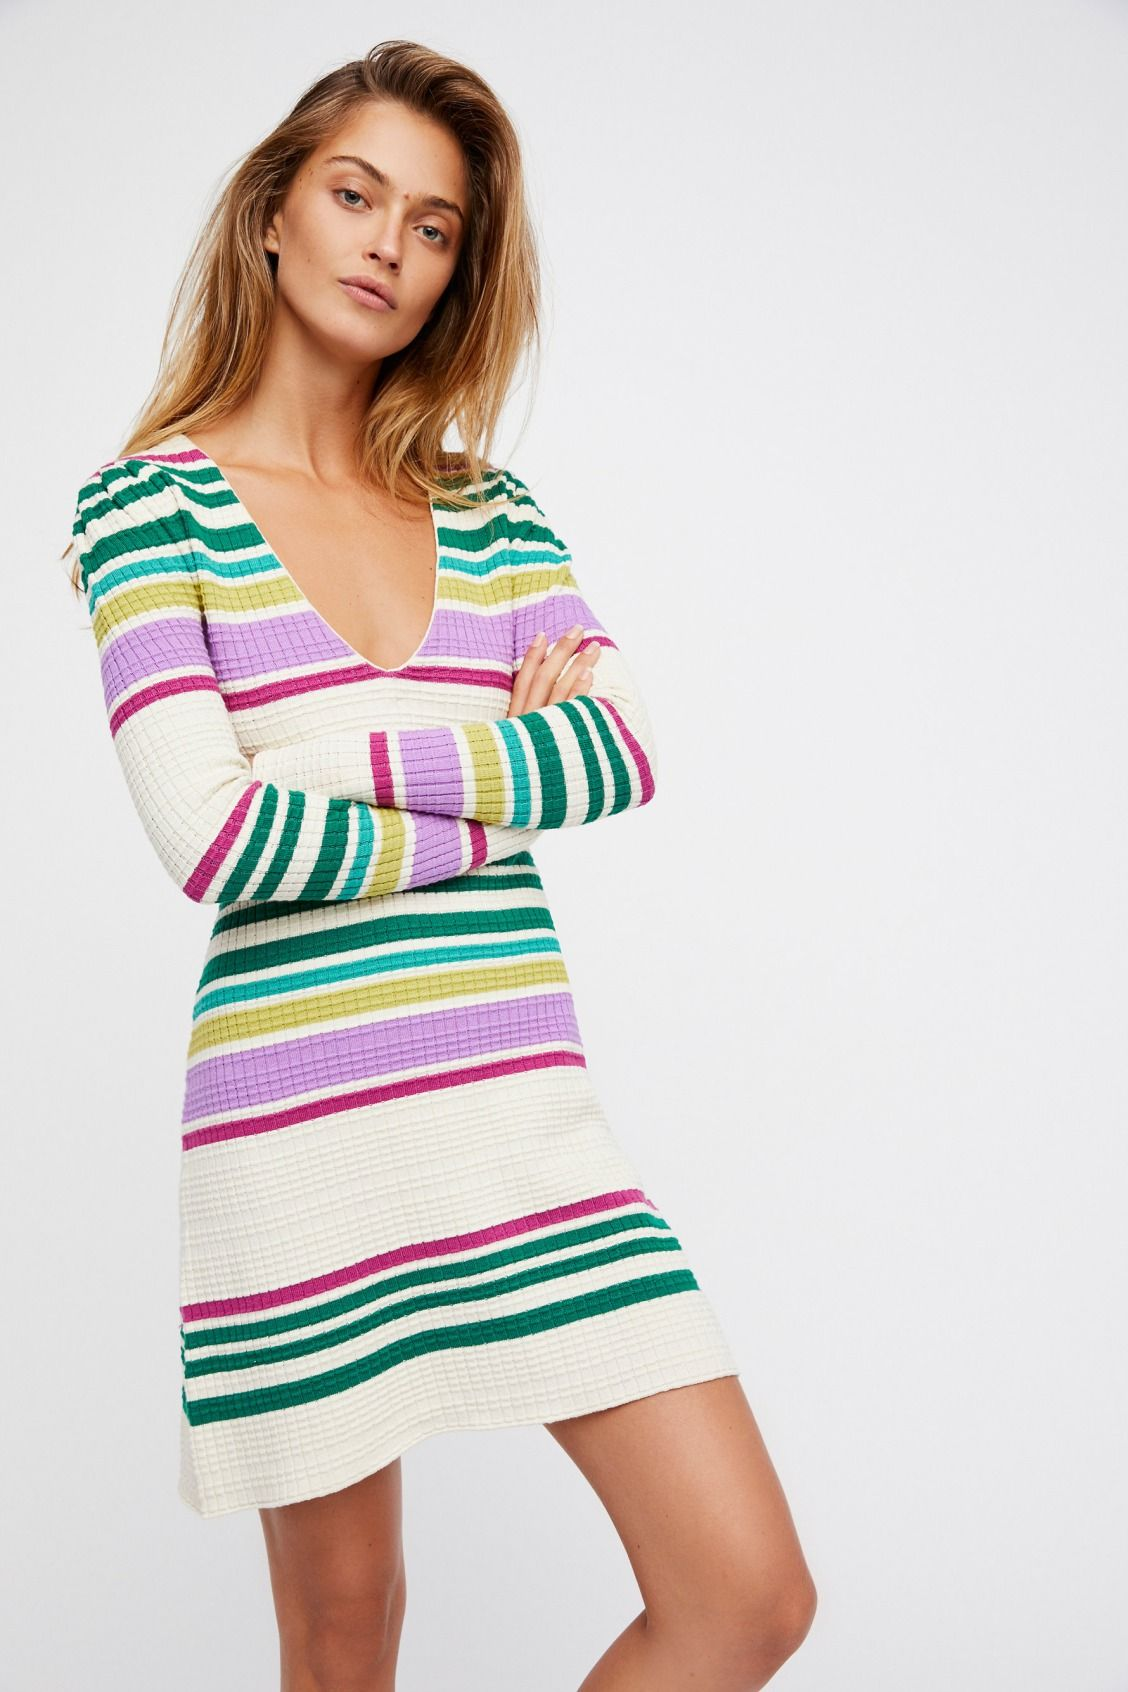 Black combo gidget sweater mini dress at free people clothing